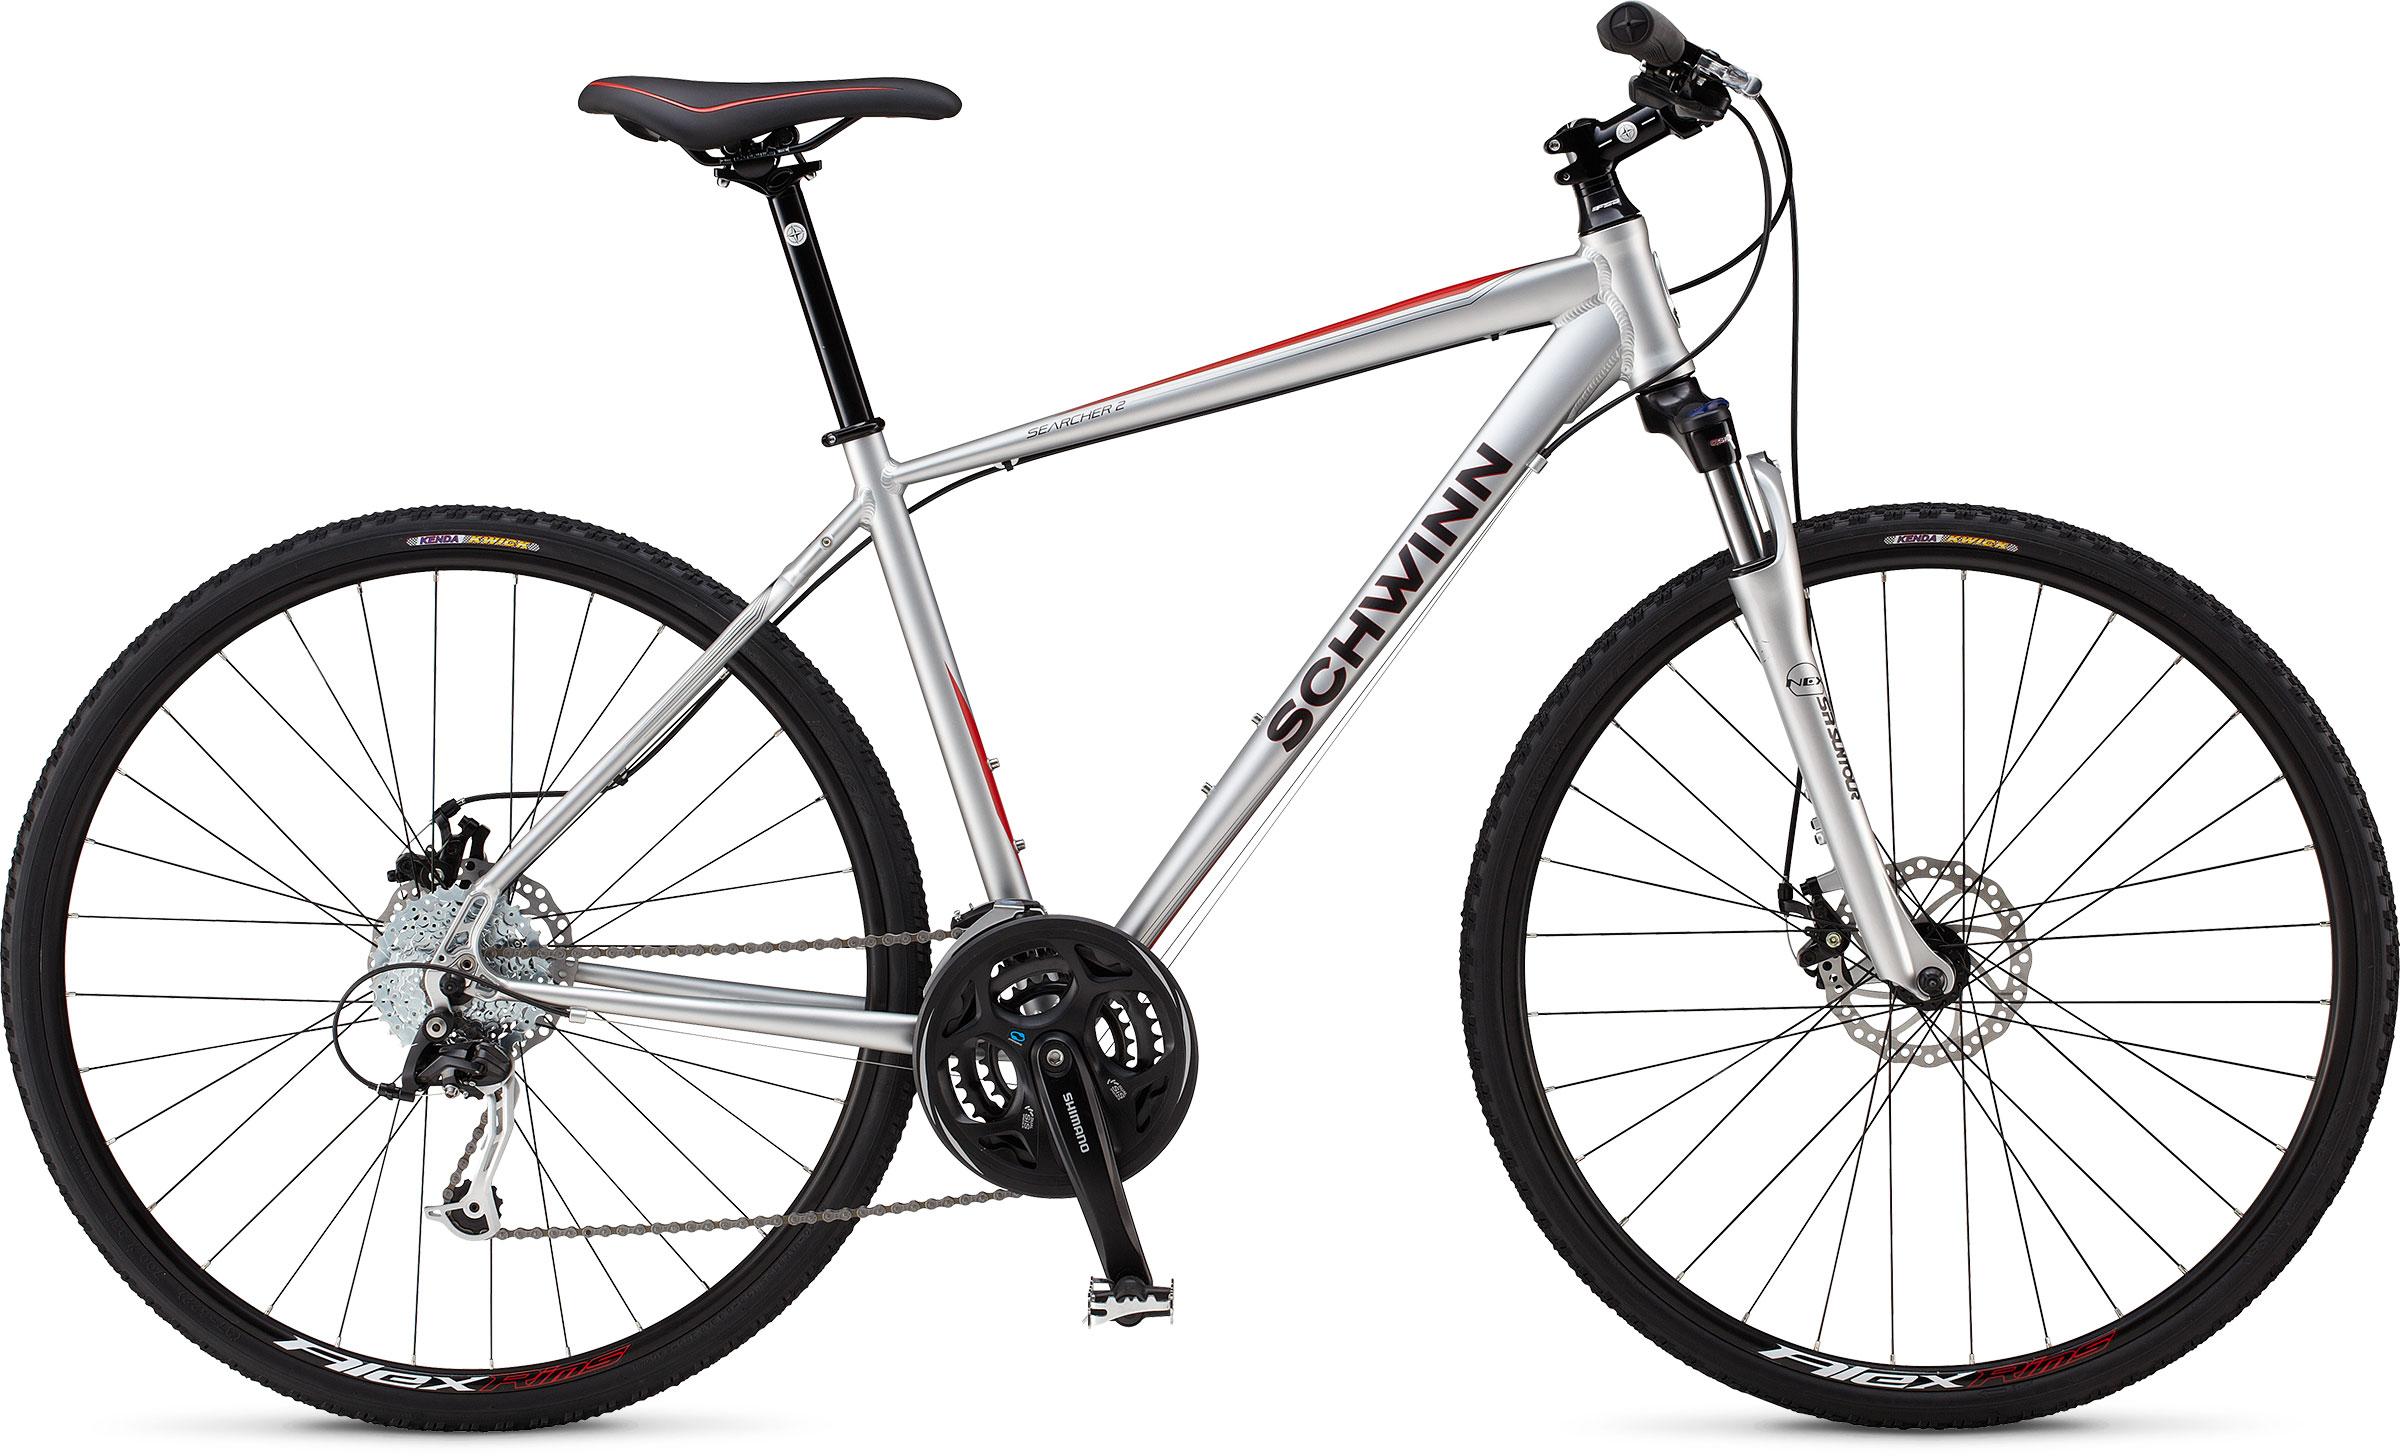 e383afabb77 Schwinn Searcher 2 - J-Town Bike, Bicycle Sales and Repair Shop ...